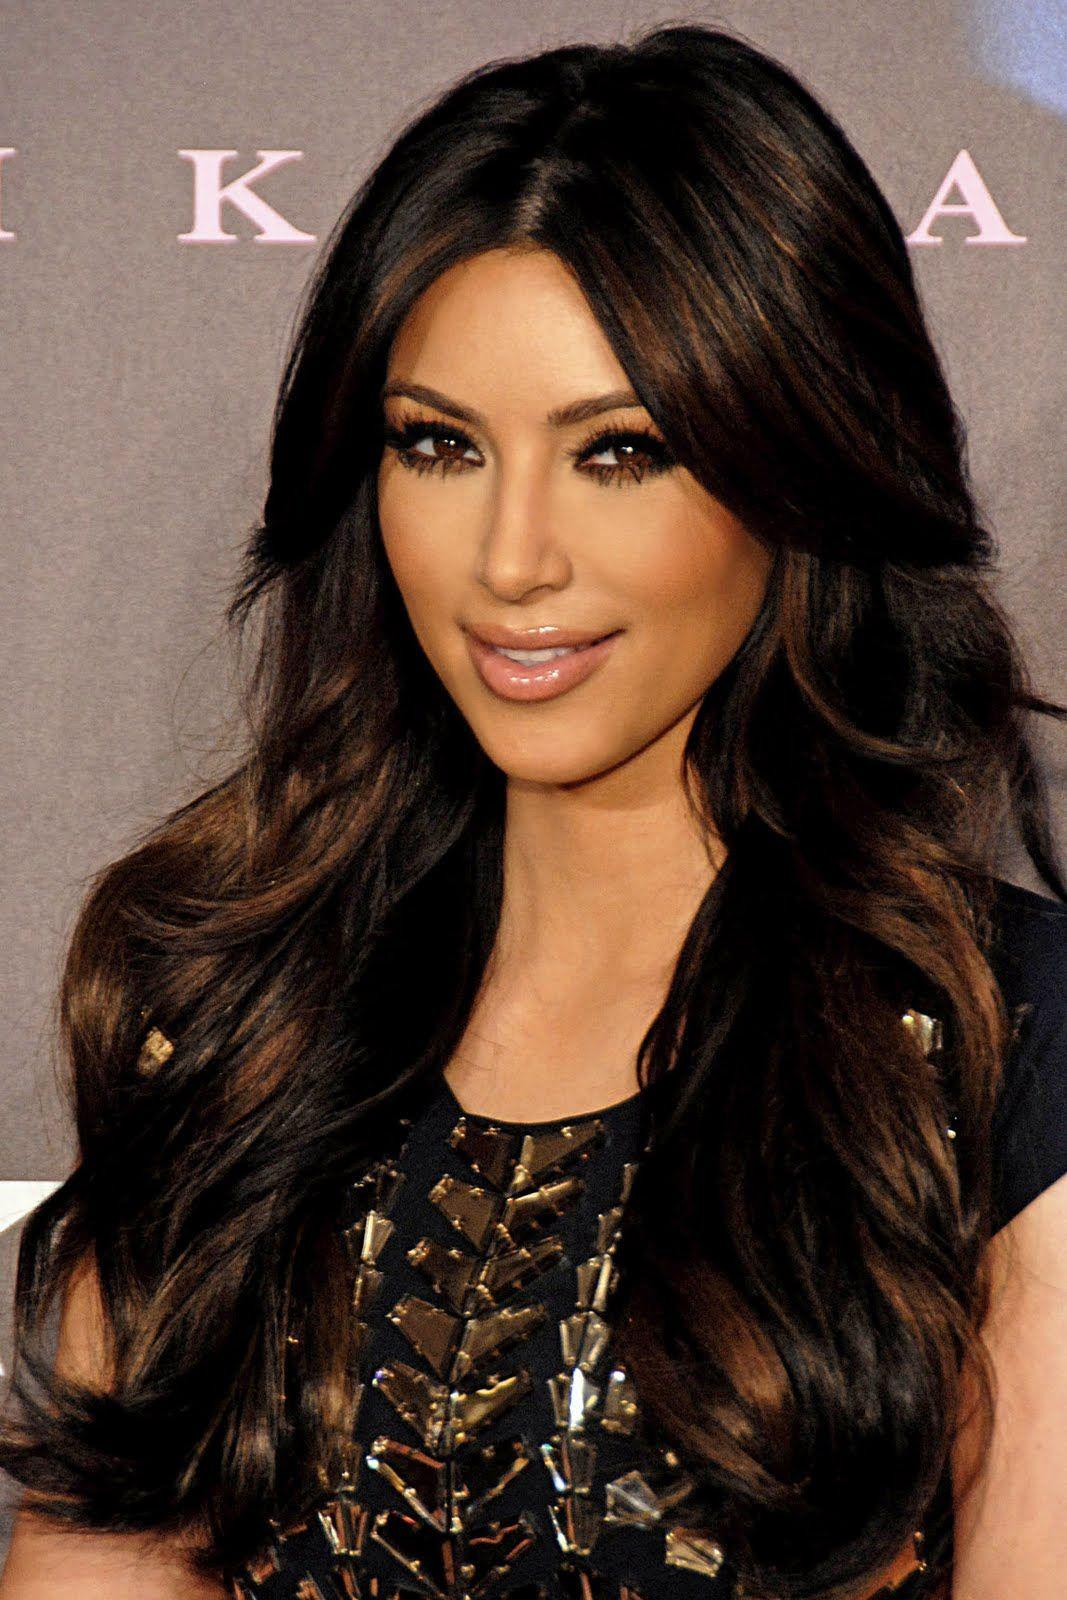 Fantastic Long Black Hair Google Search New Hair Ideas Pinterest Kim Short Hairstyles For Black Women Fulllsitofus